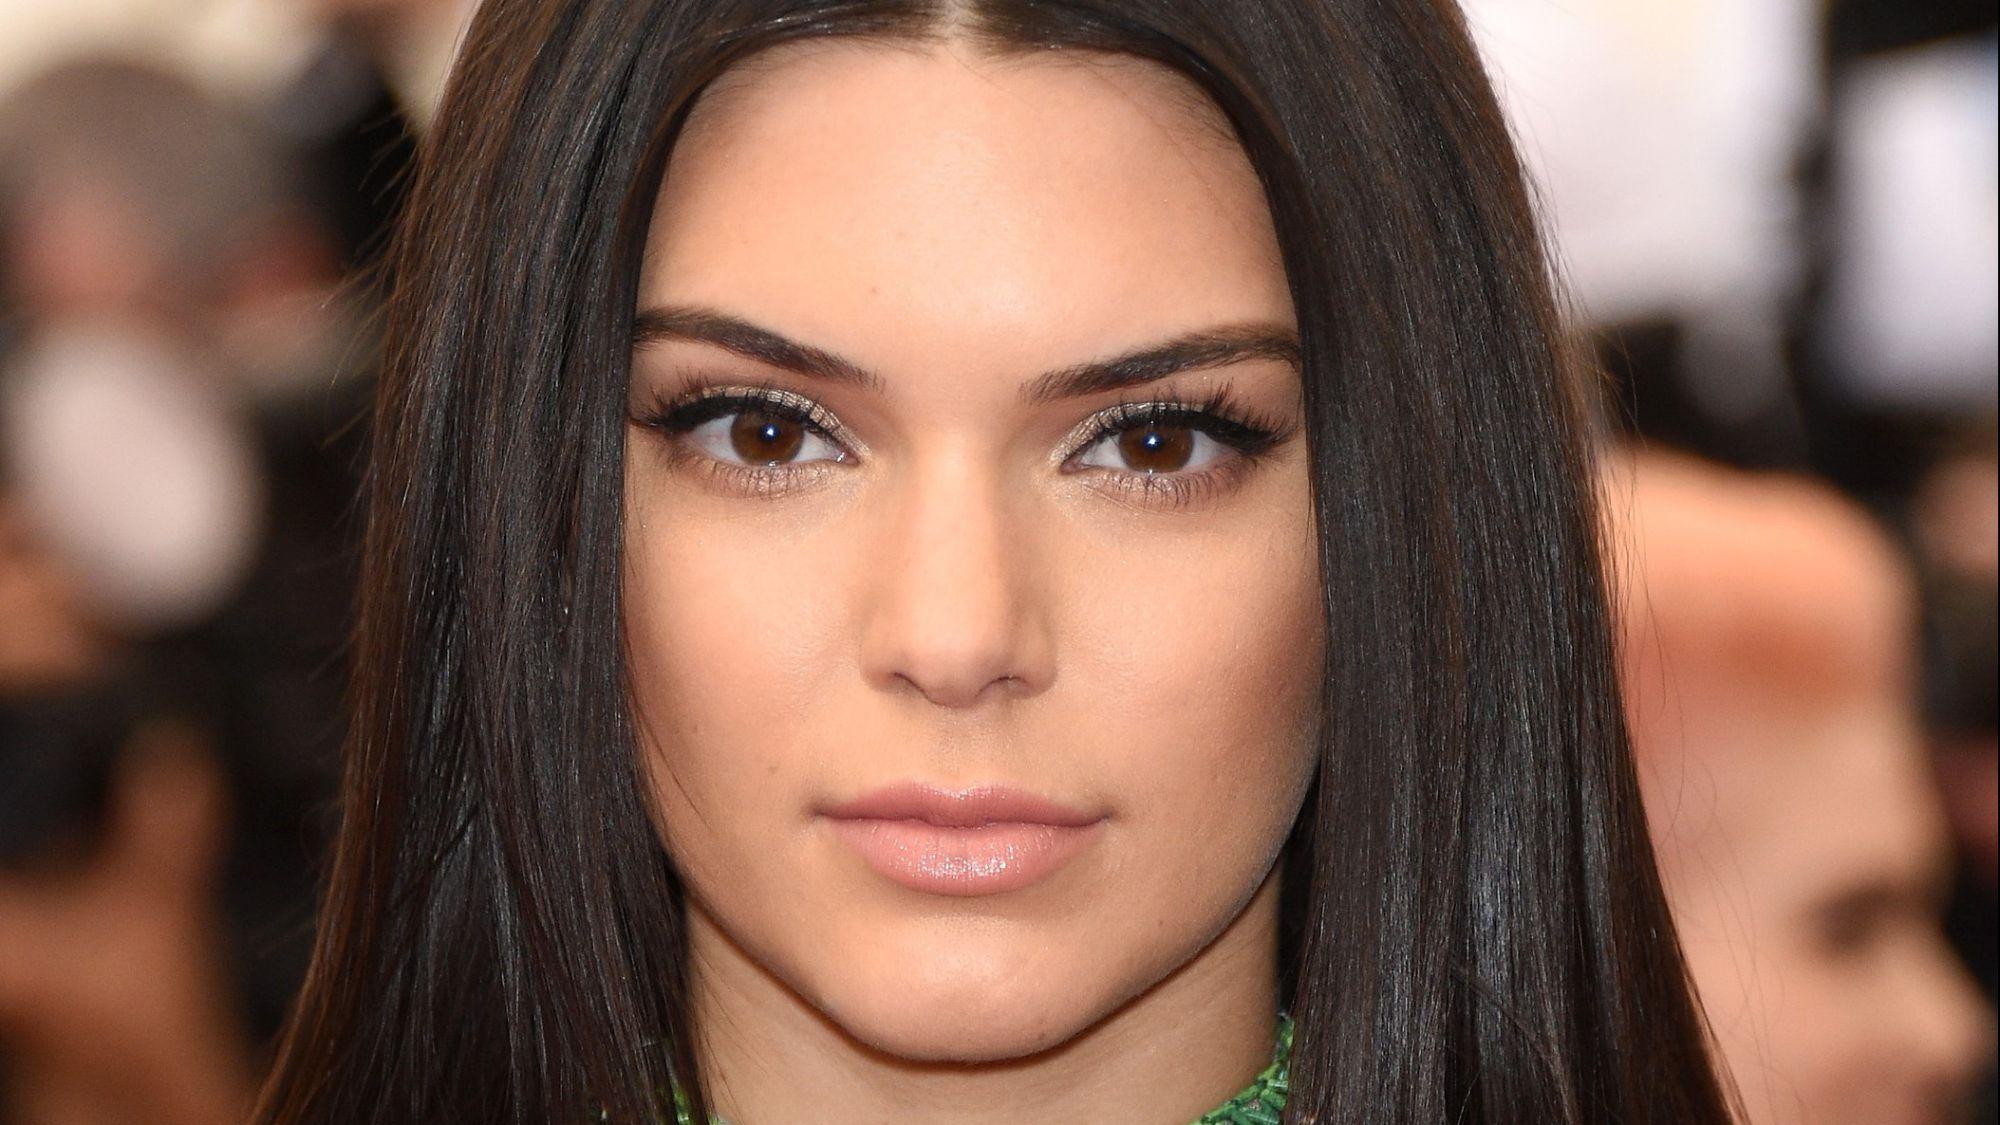 I 21 anni di Kendall Jenner tra reality show e copertine fashion